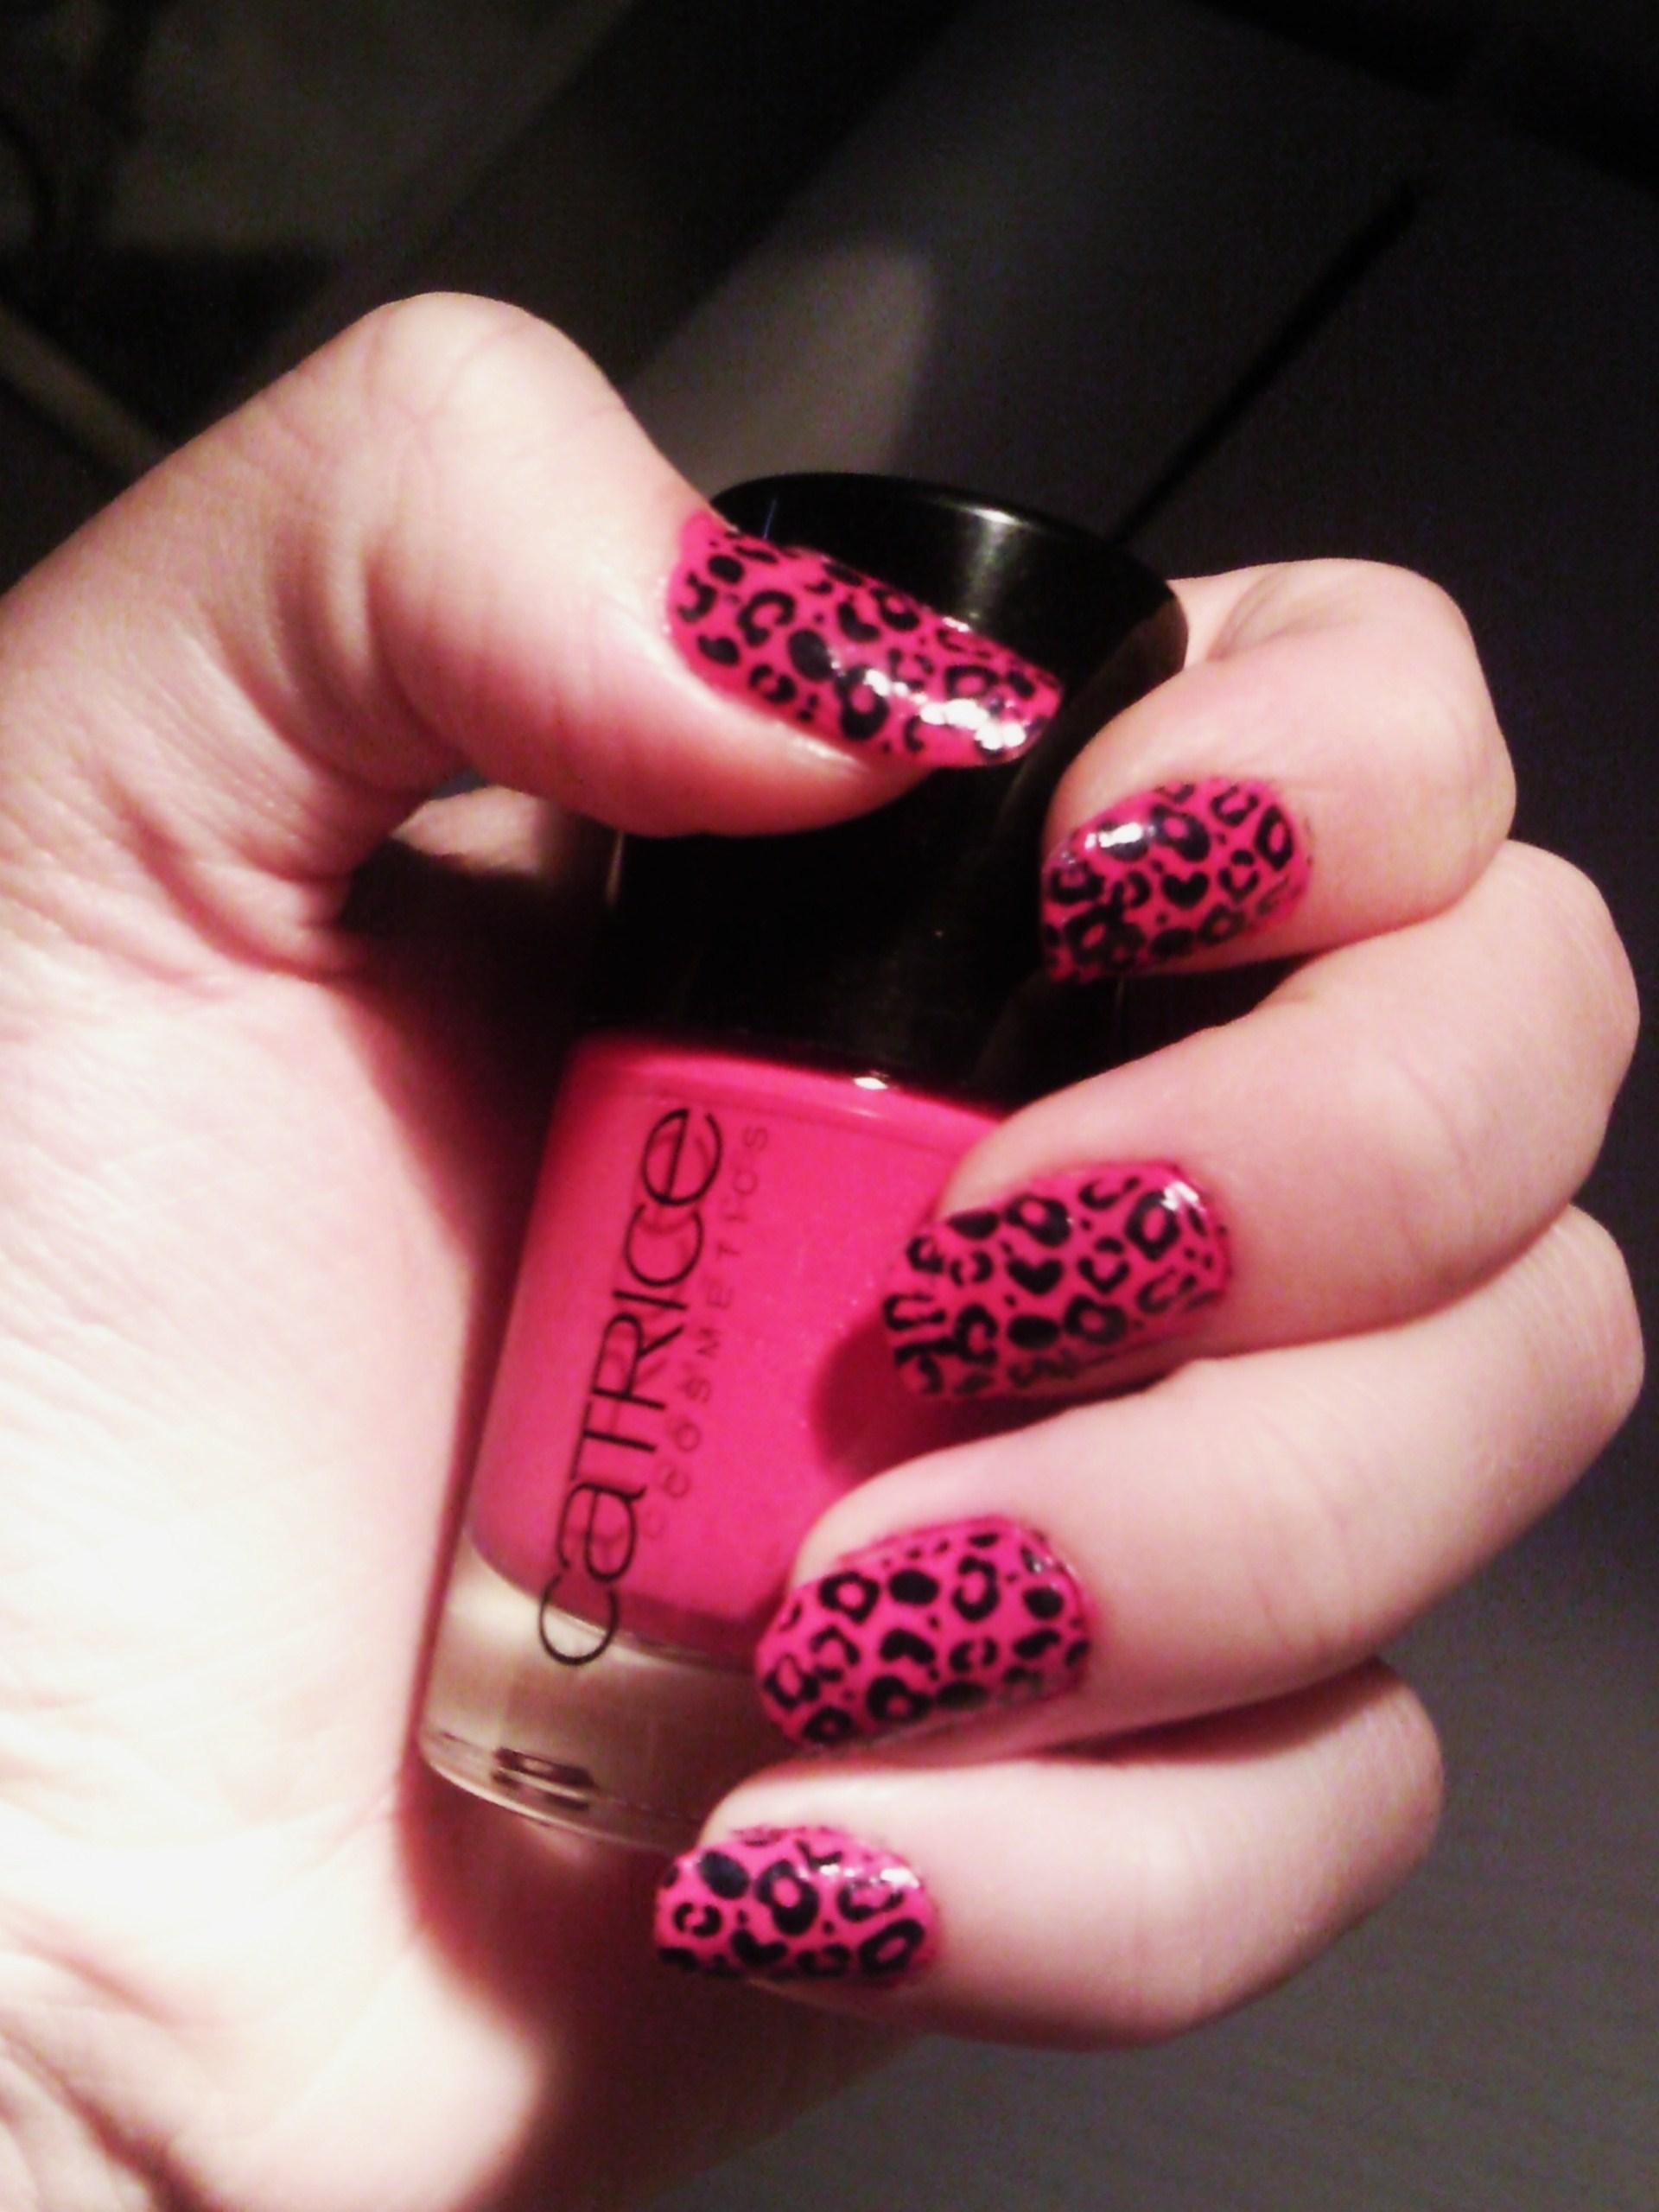 Pink leopard nails by sasxcha on deviantart pink leopard nails by sasxcha pink leopard nails by sasxcha prinsesfo Choice Image